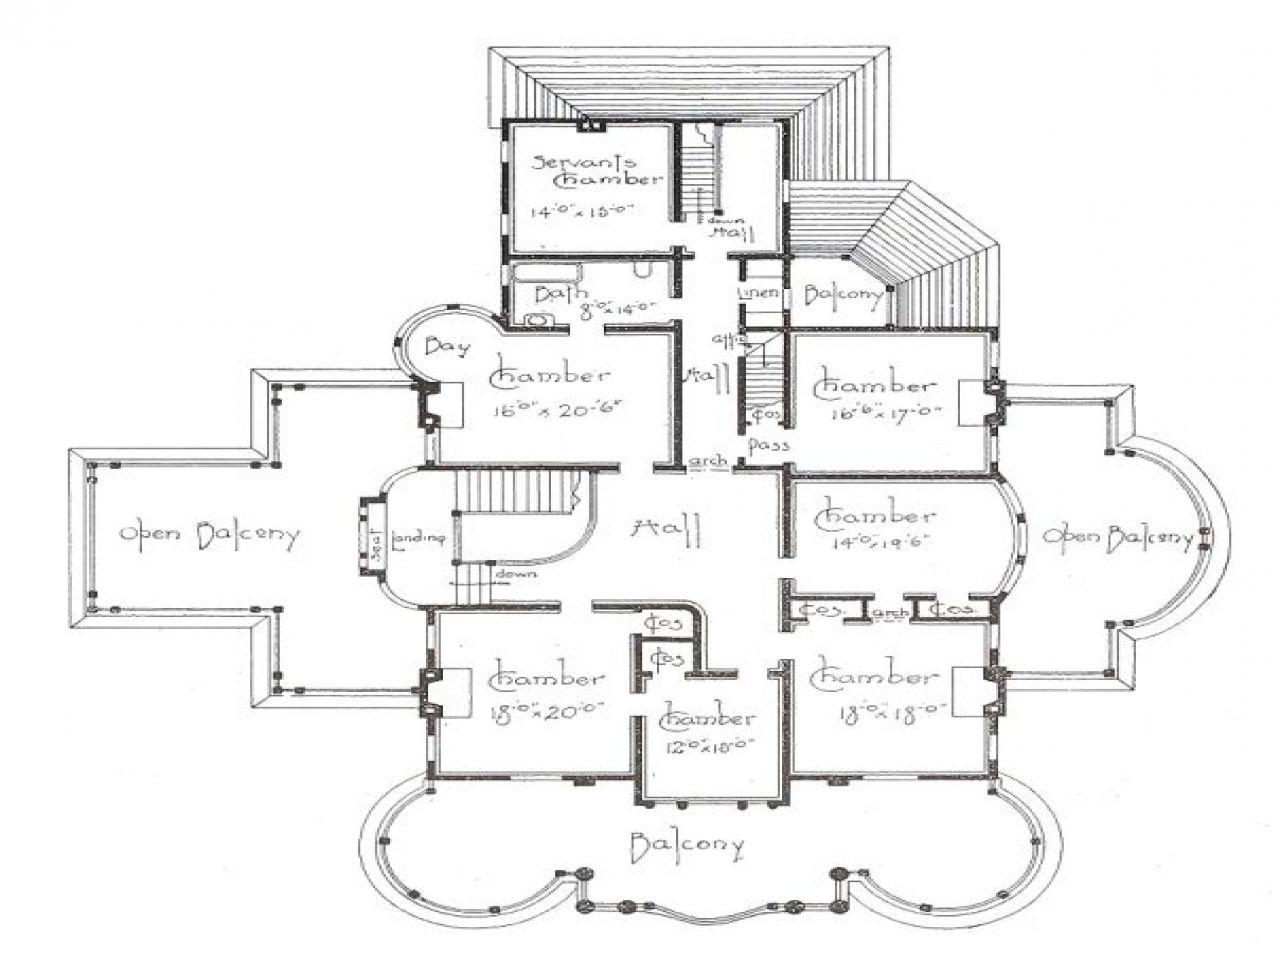 George barber house plans | Floor Plans | Pinterest | House